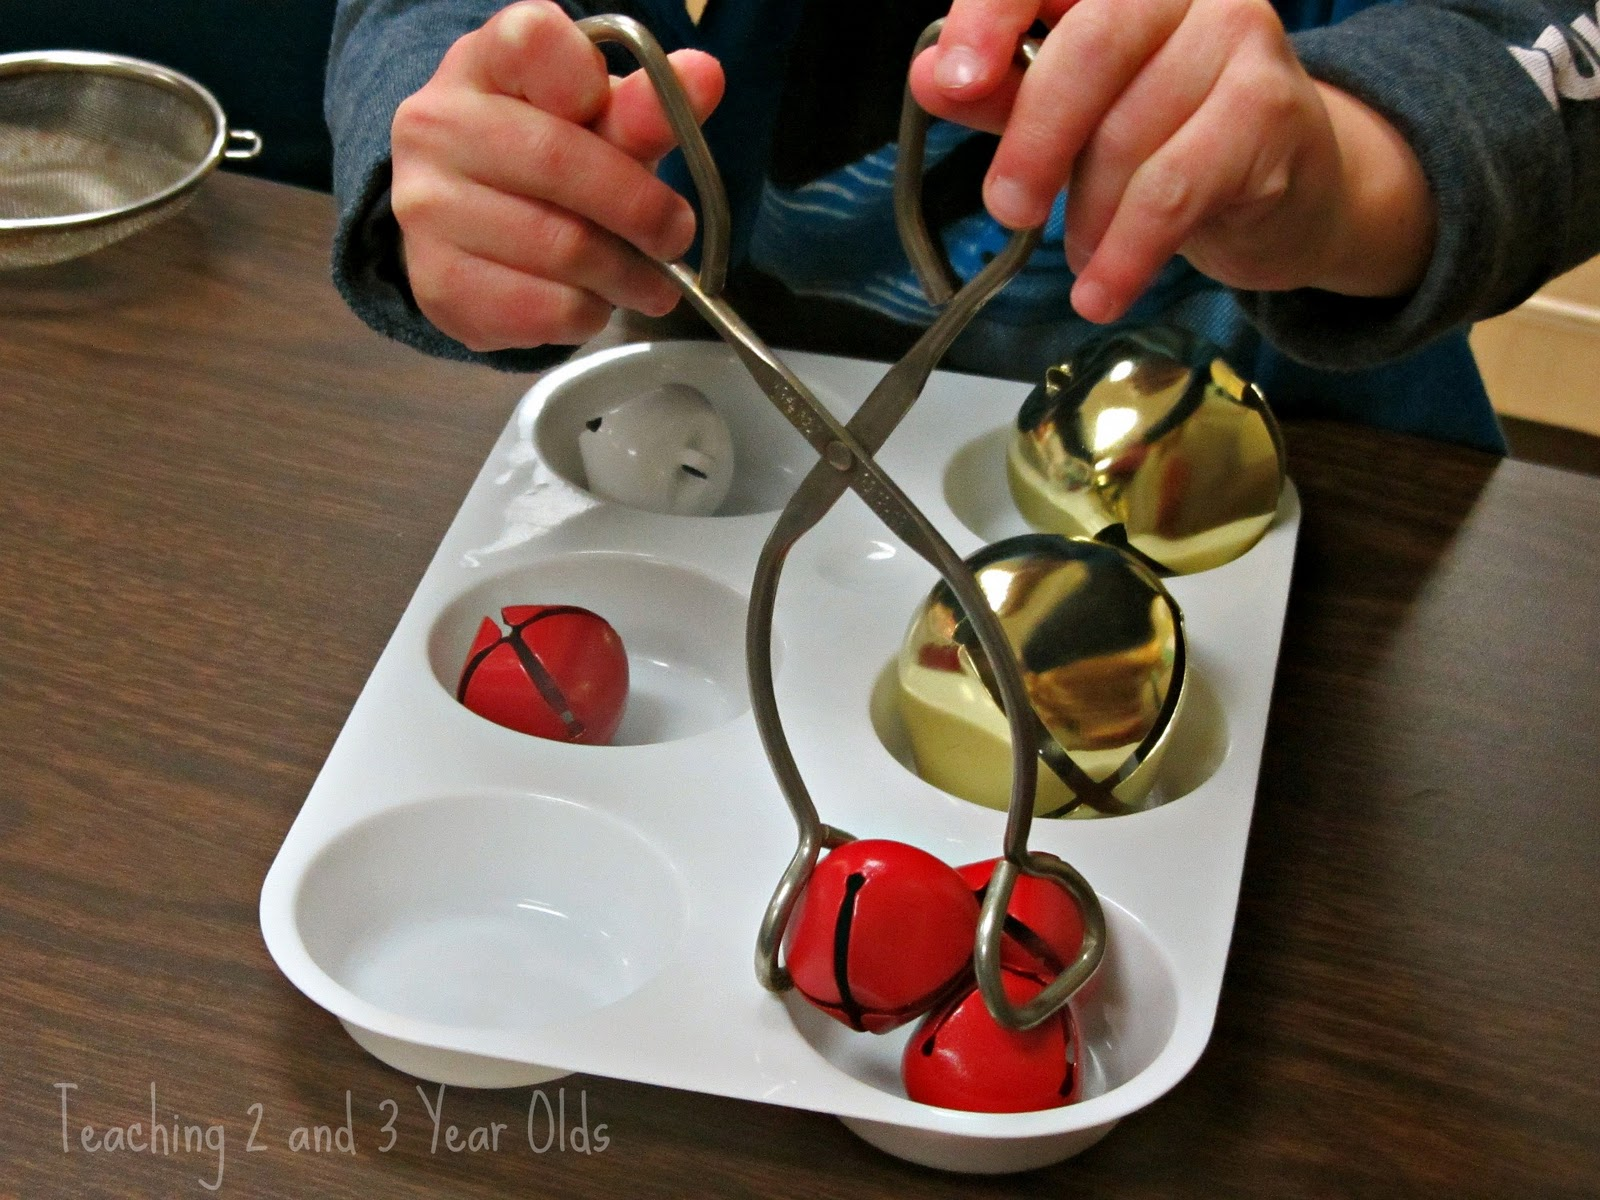 Teaching 2 And 3 Year Olds Preschool Christmas Fine Motor